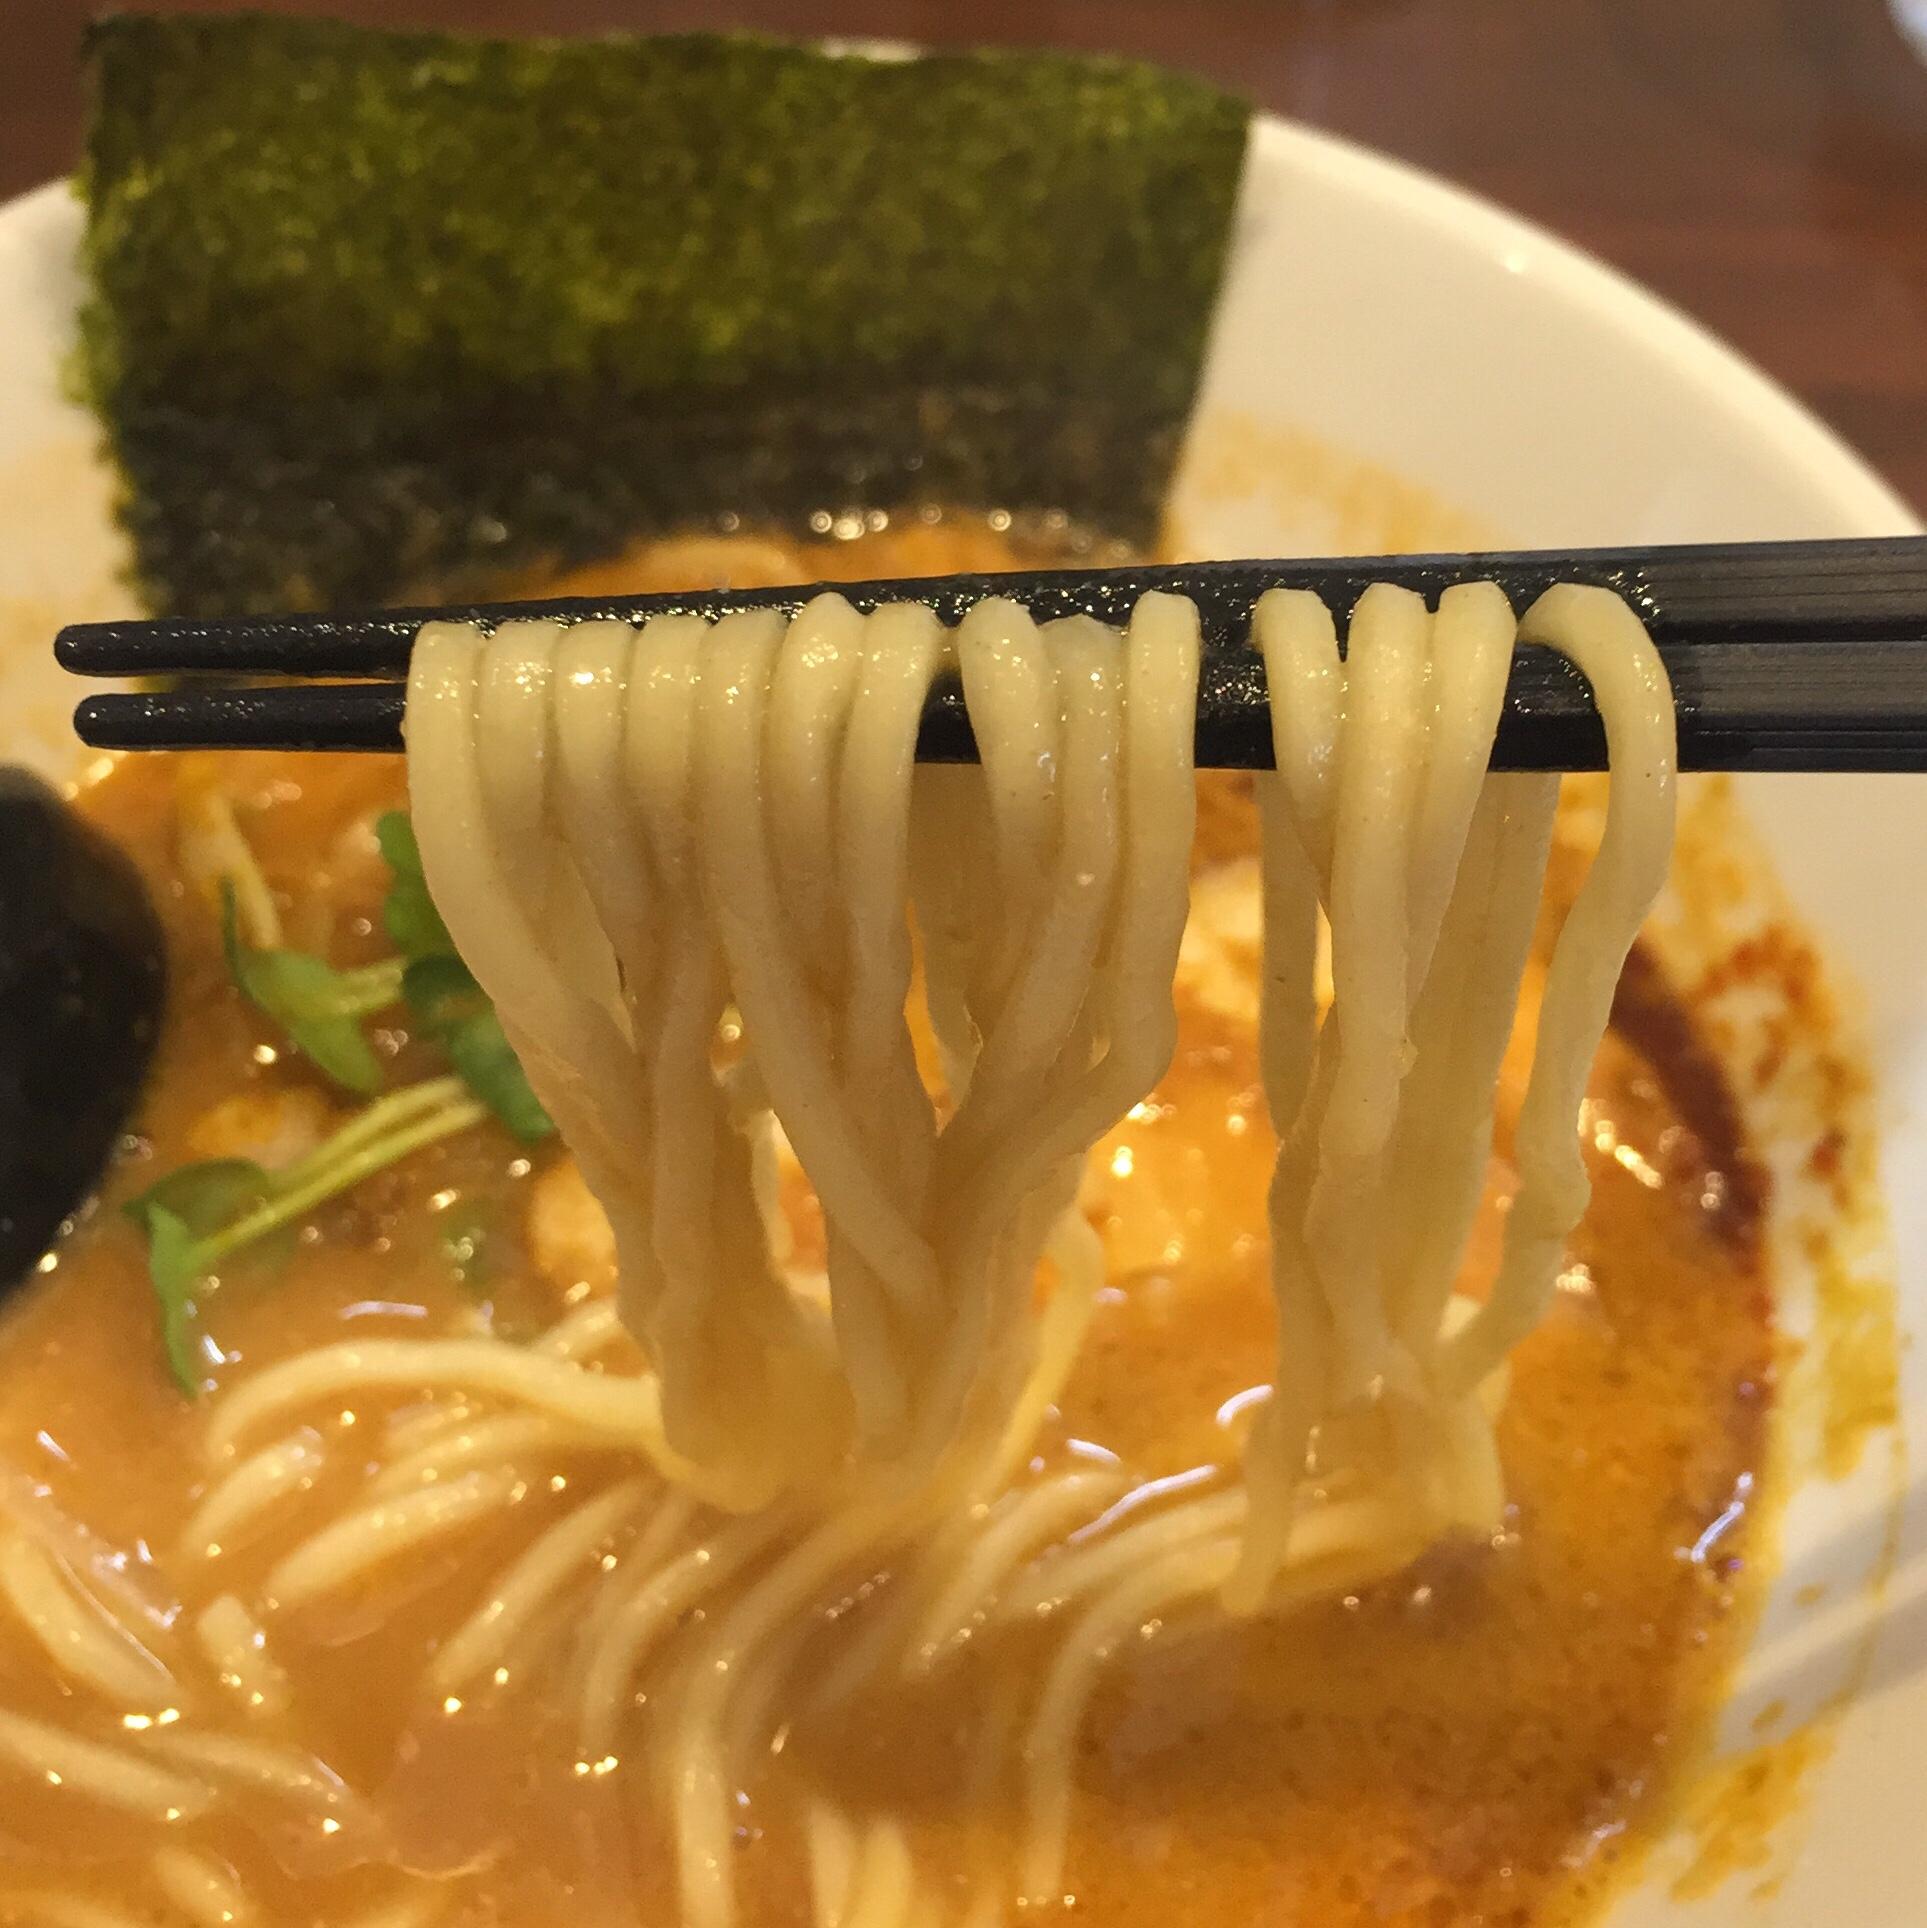 NOODLE SHOP KOUMITEI(香味亭) オマール海老香る濃厚ラーメン 濃厚味噌カレーヌードル 麺